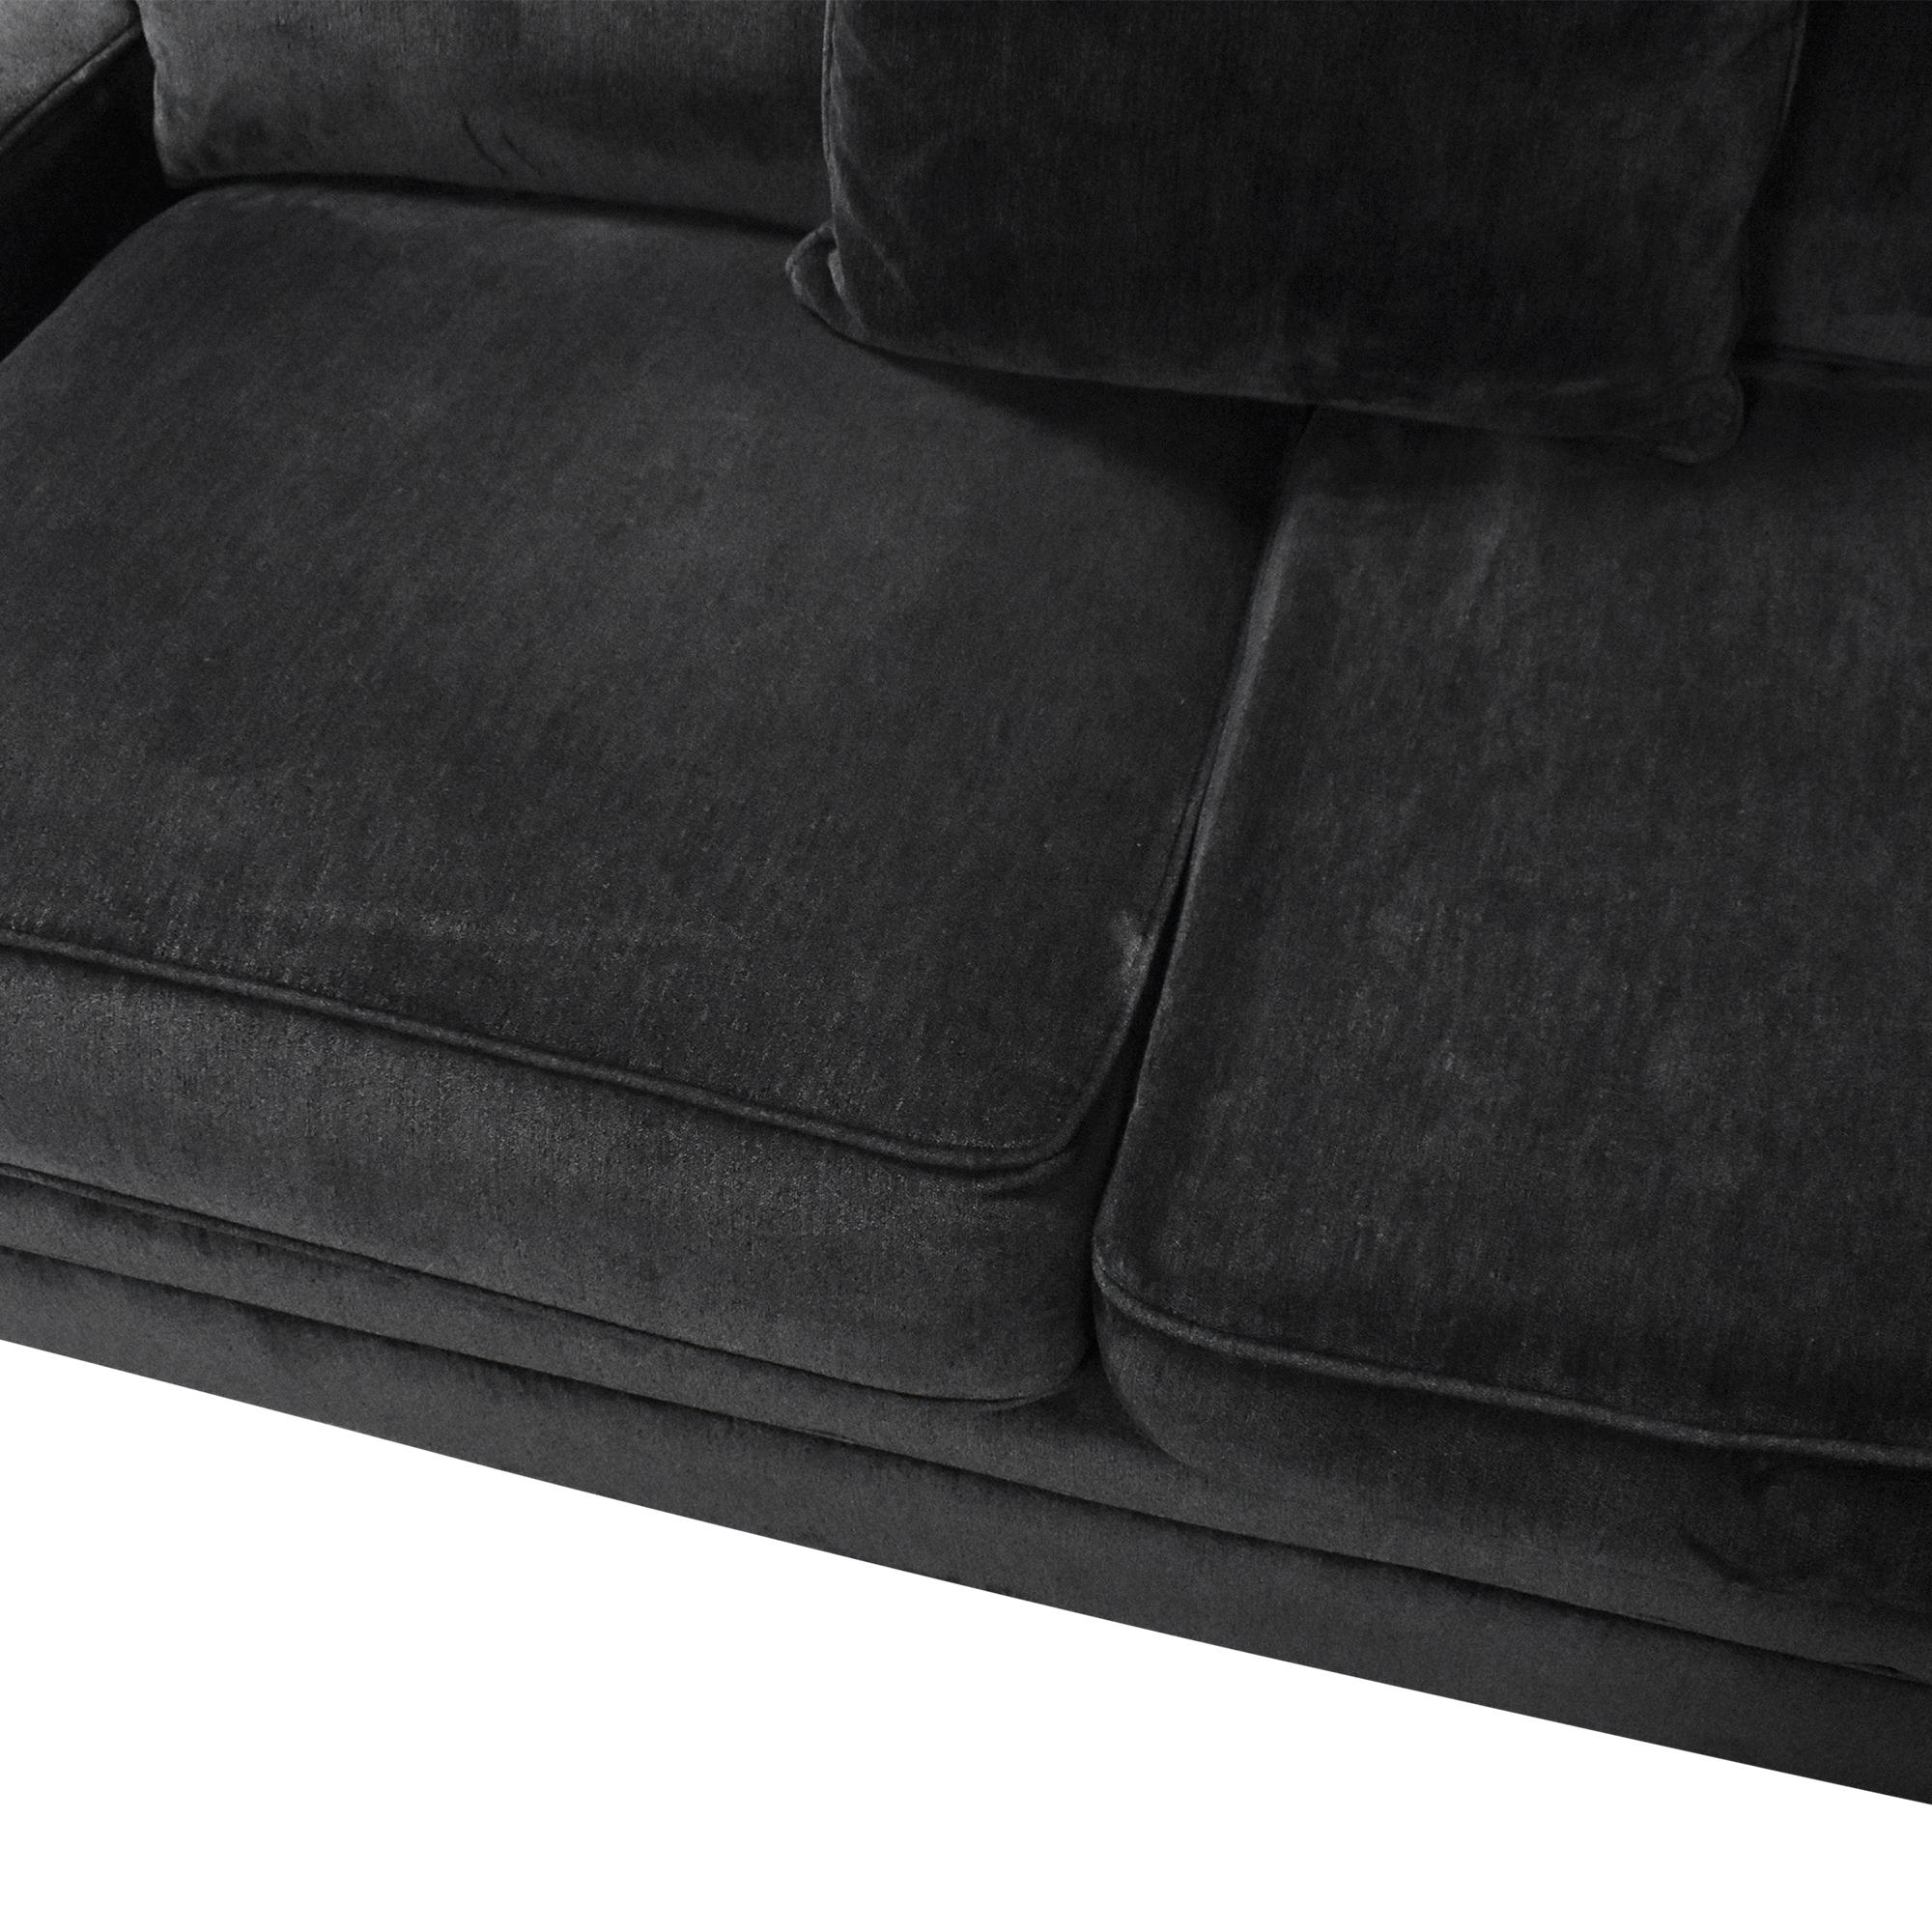 Macy's Teddy Four Piece Chaise Sectional Sofa sale